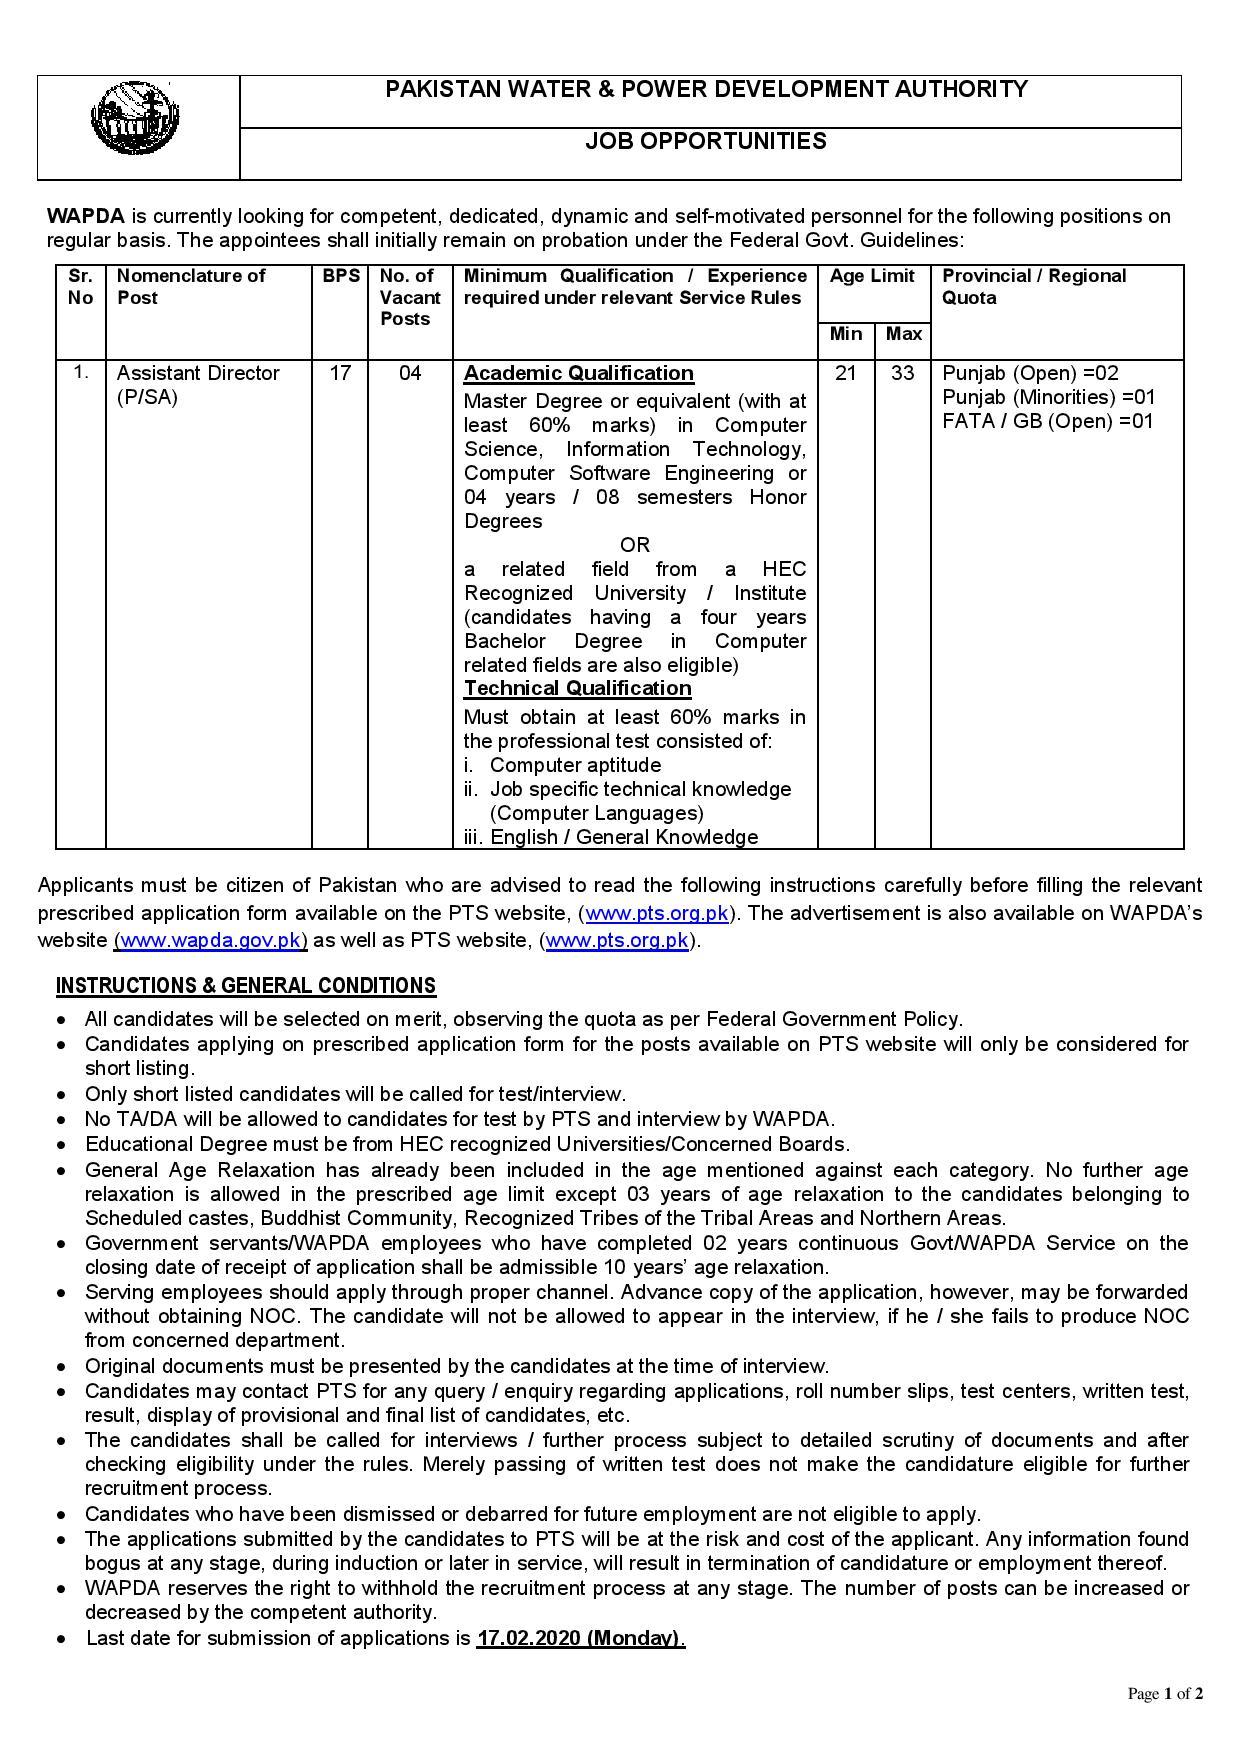 Water & Power Development Authority WAPDA Phase VI PTS Jobs 2020 Apply Online Roll No Slip Download